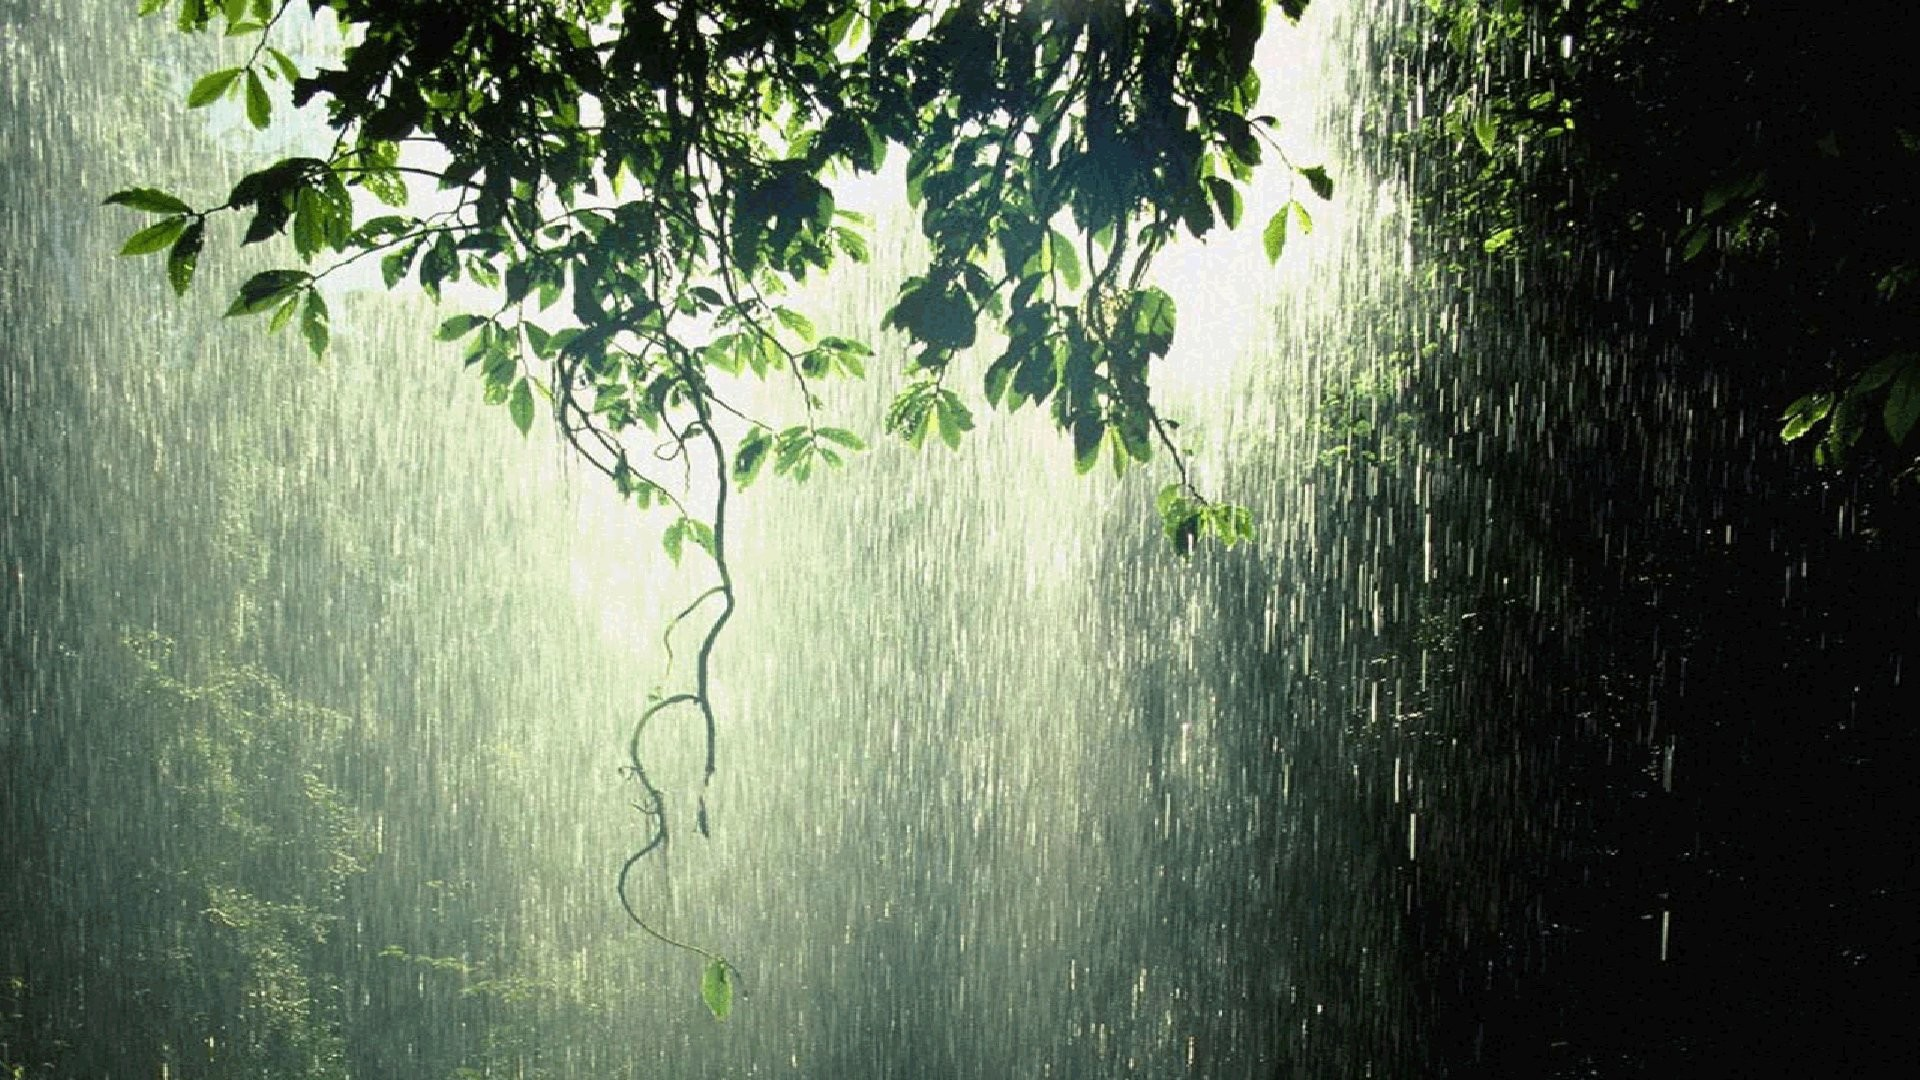 Photography – Rain Forest Green Wallpaper